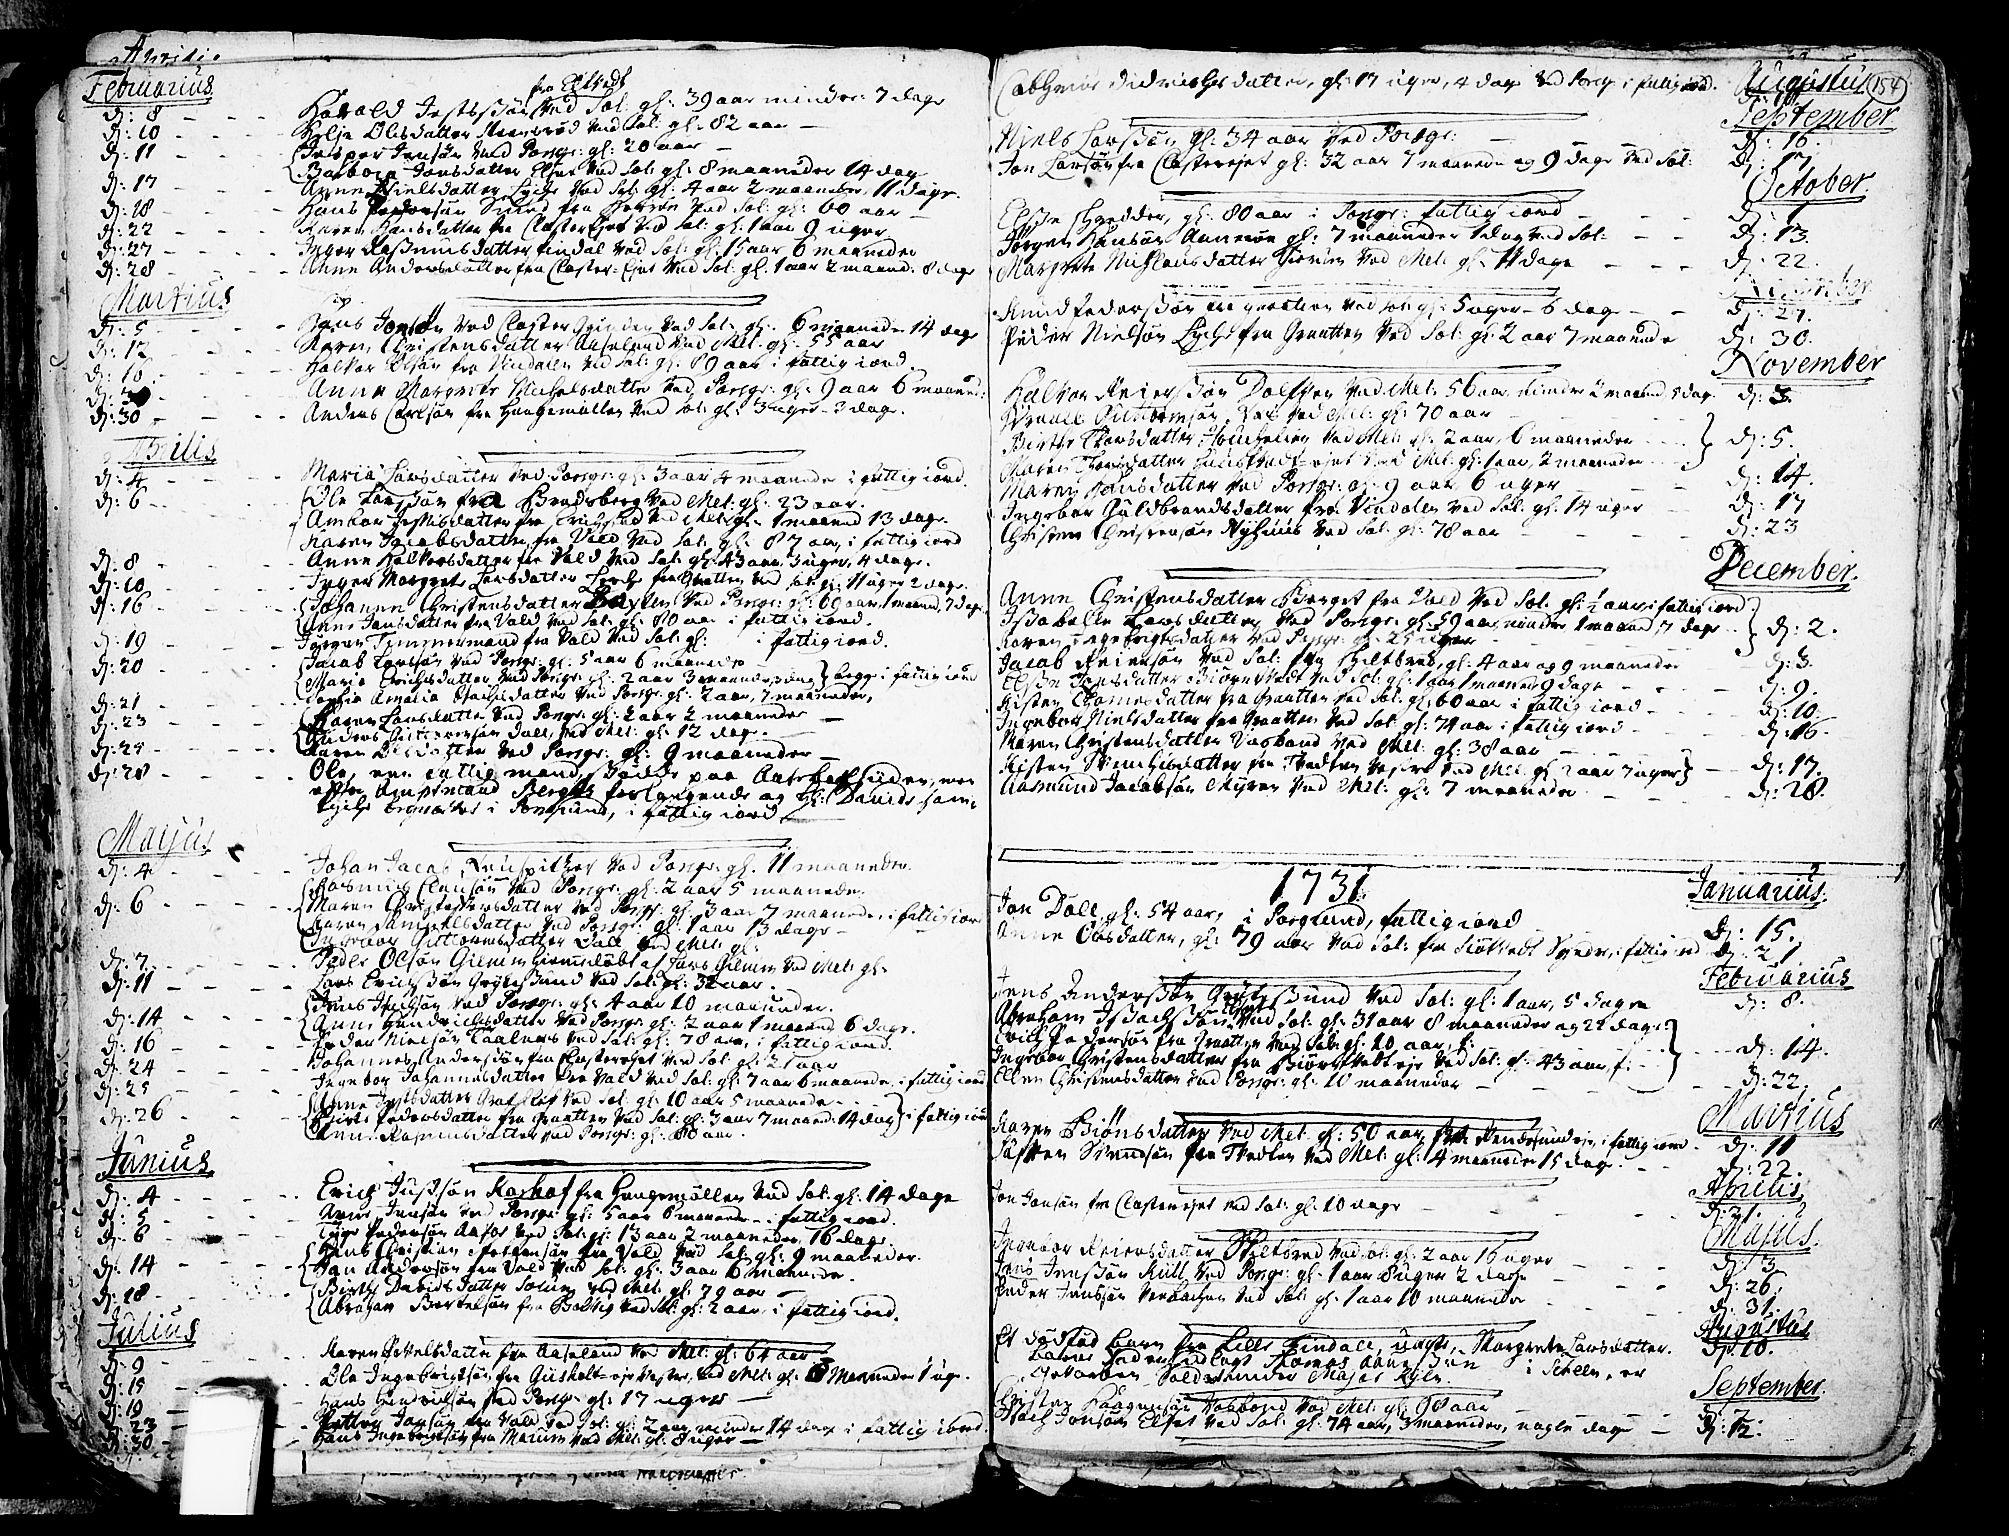 SAKO, Solum kirkebøker, F/Fa/L0002: Ministerialbok nr. I 2, 1713-1761, s. 154